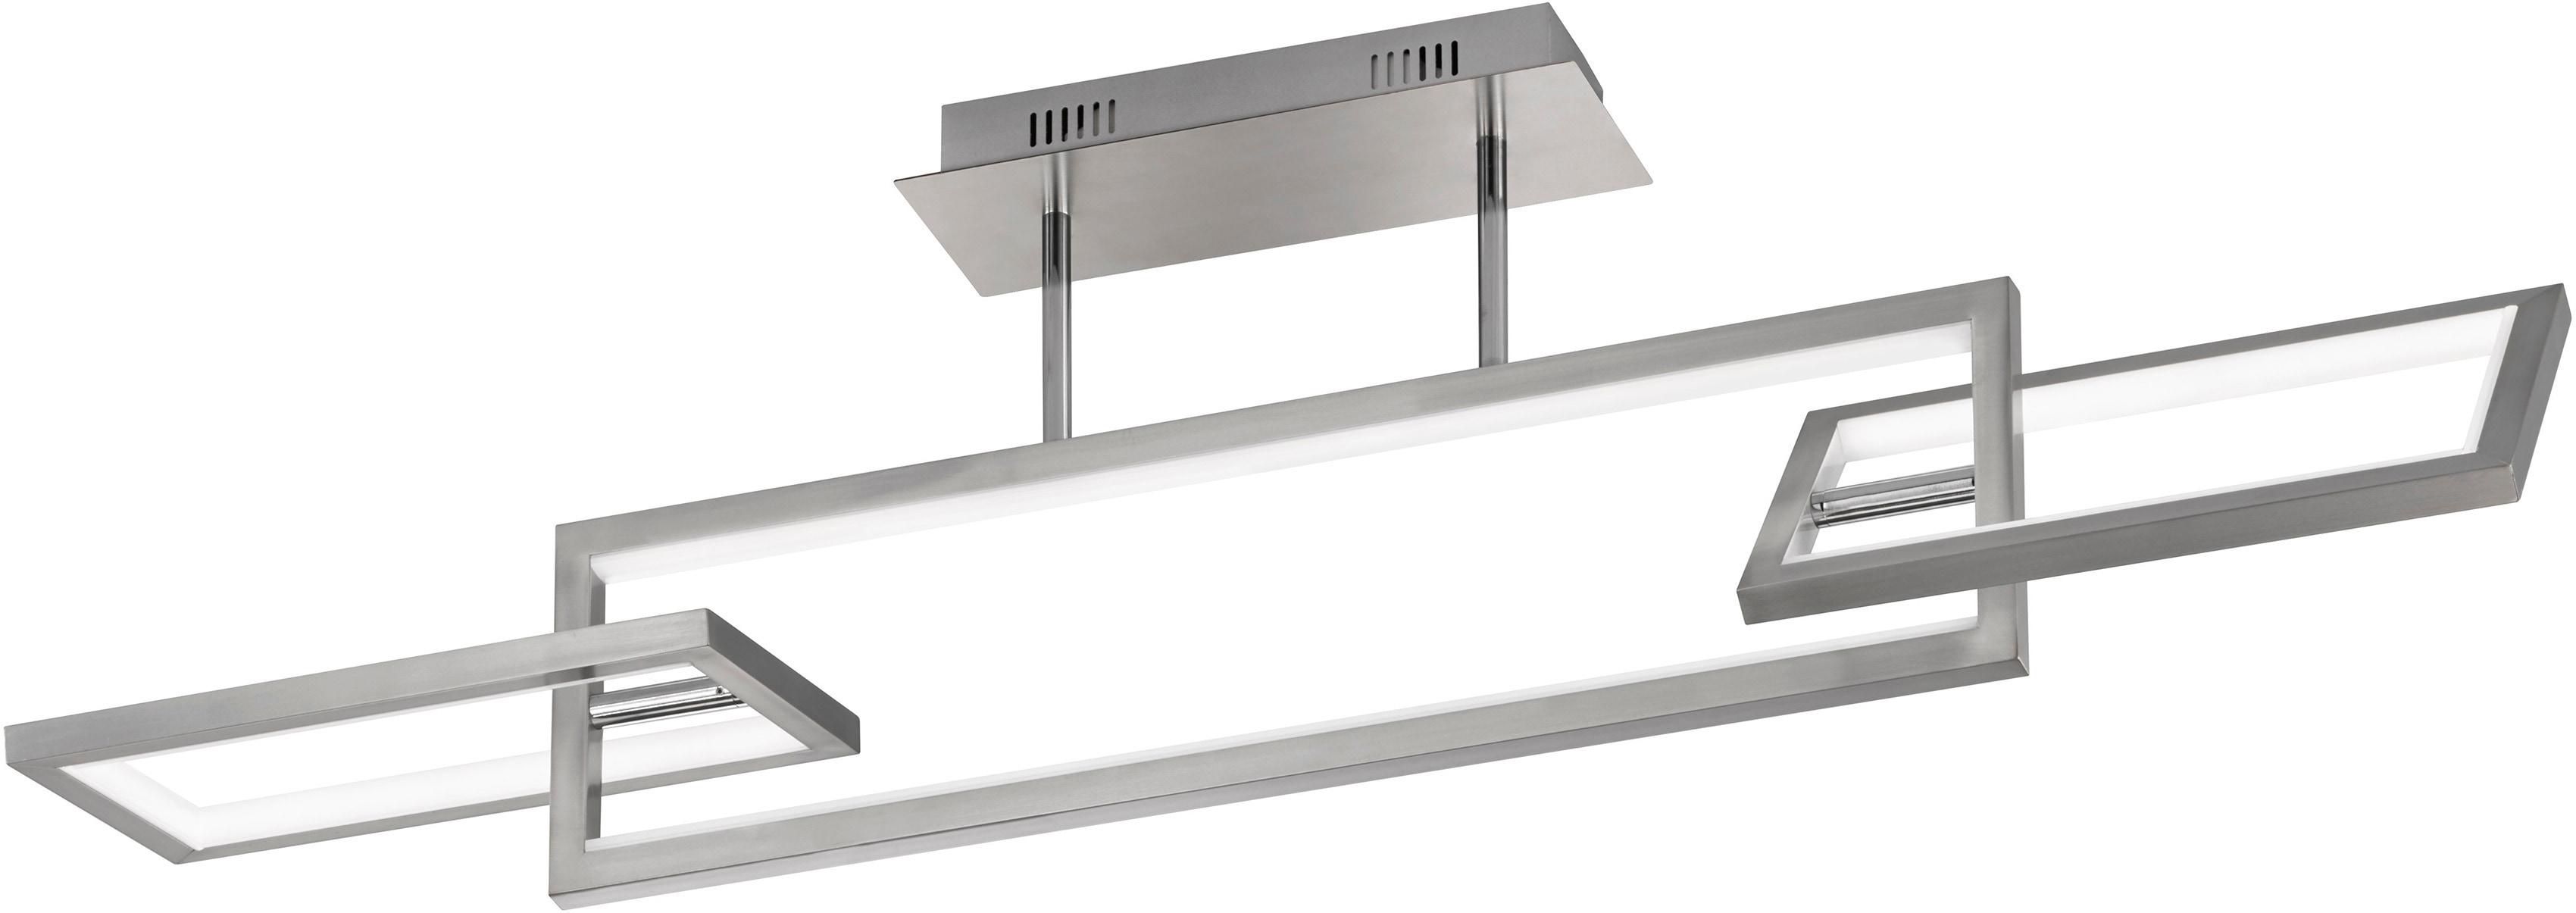 WOFI LED Deckenleuchte MURIEL, LED-Board, Warmweiß, dimmbar mittels 3-Stufen-Wandschalter